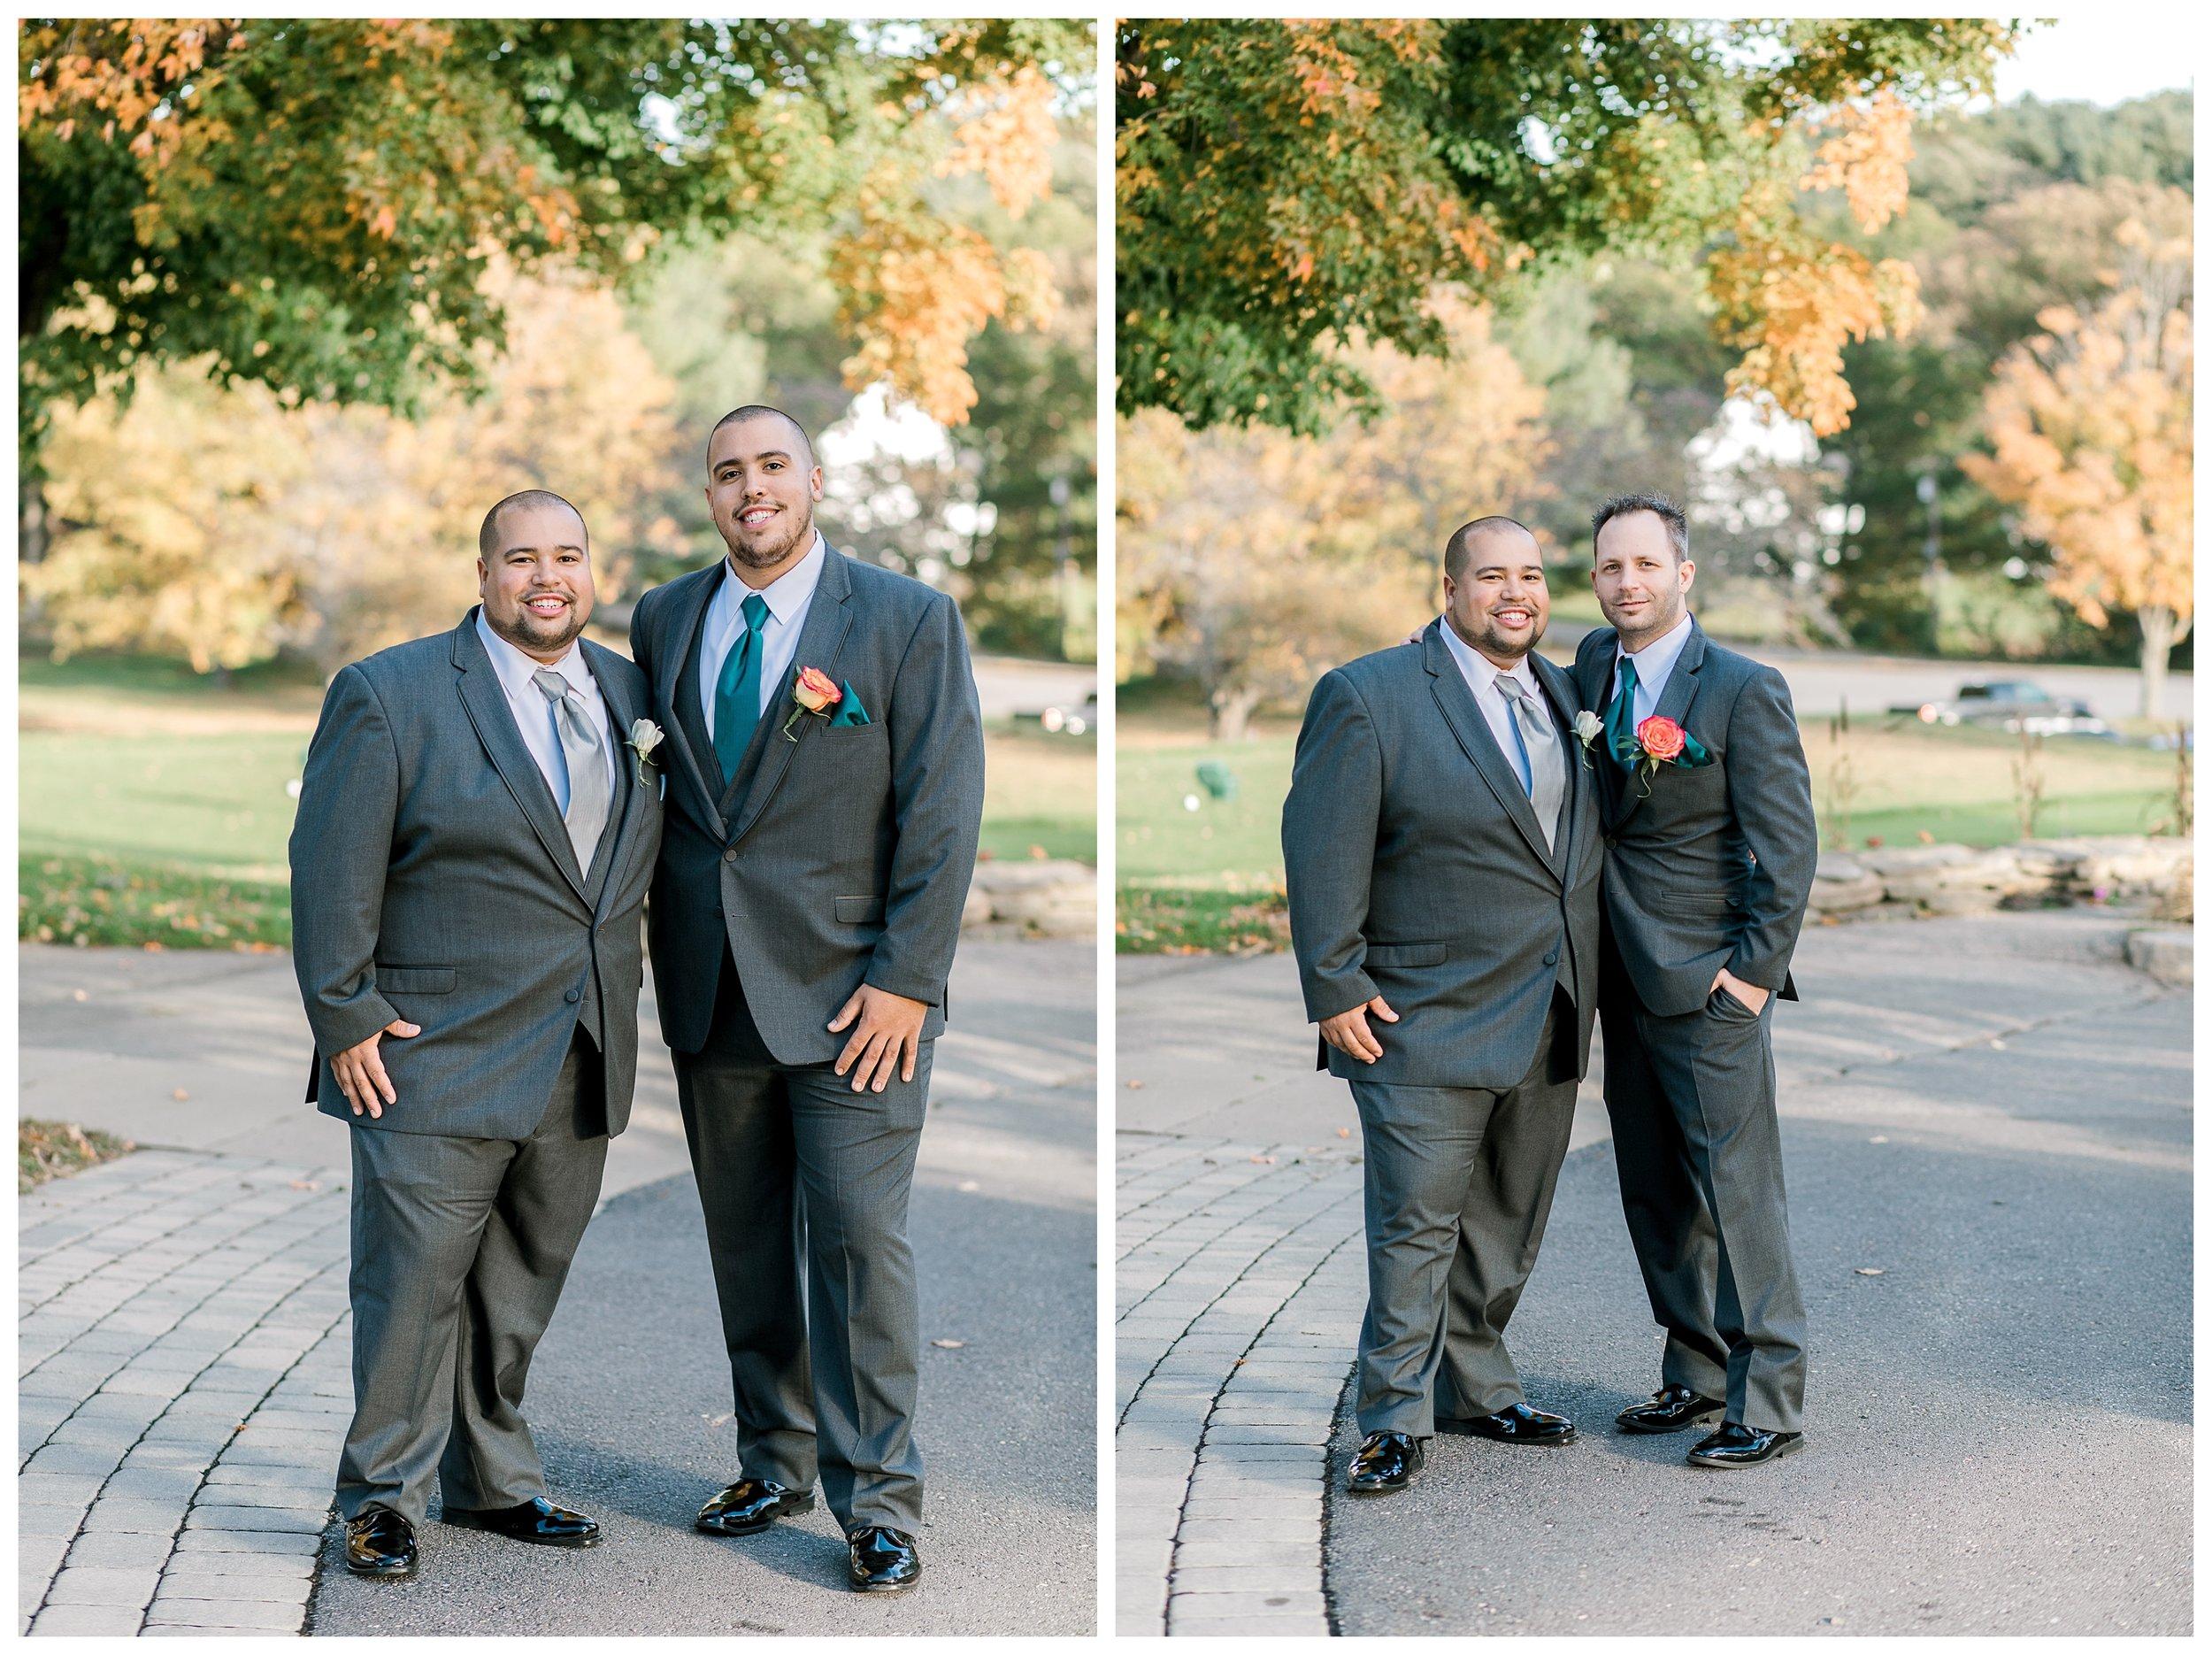 pleasant_valley_country_club_wedding_sutton_erica_pezente_photography (28).jpg